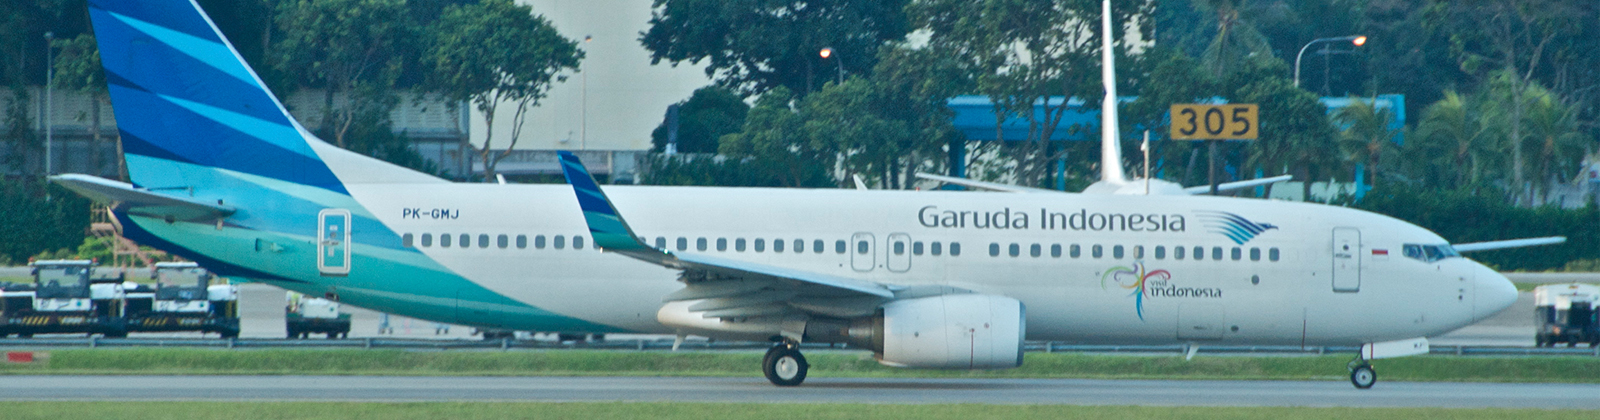 Cara Reschedule Tiket Garuda Indonesia Skyscanner Indonesia